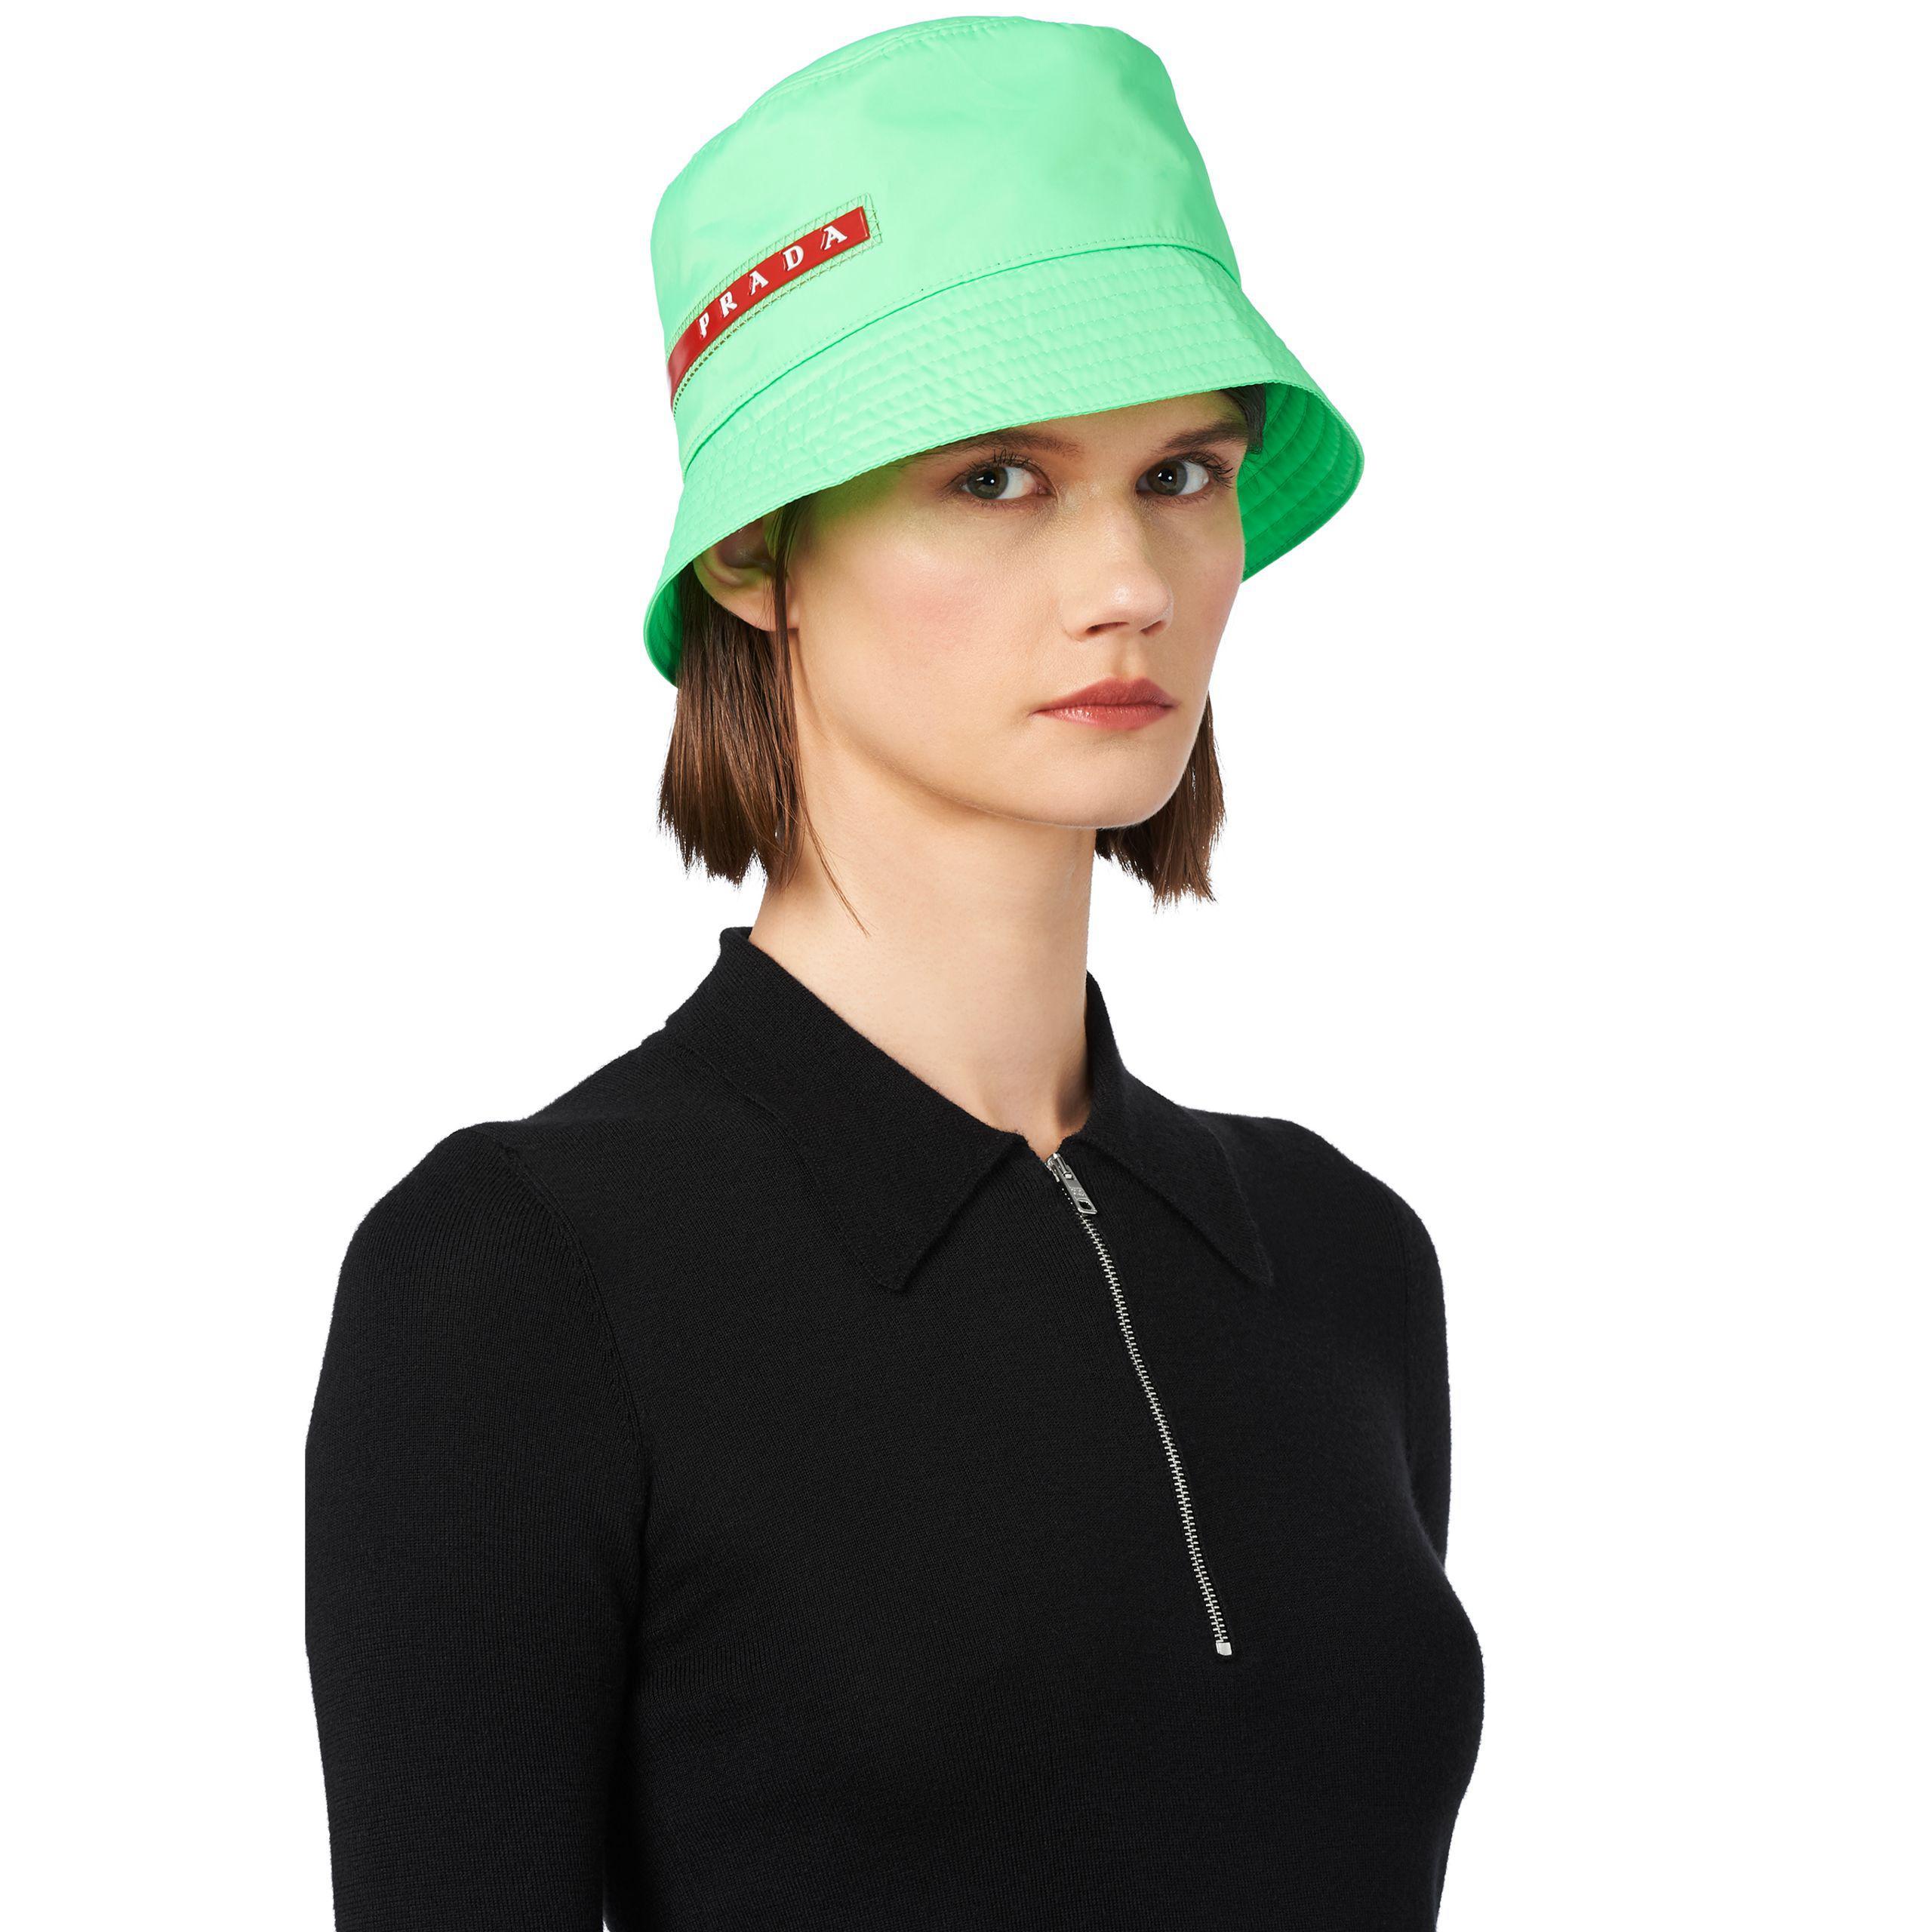 d1f6b4c7d17 Lyst - Prada Technical Fabric Cap in Green